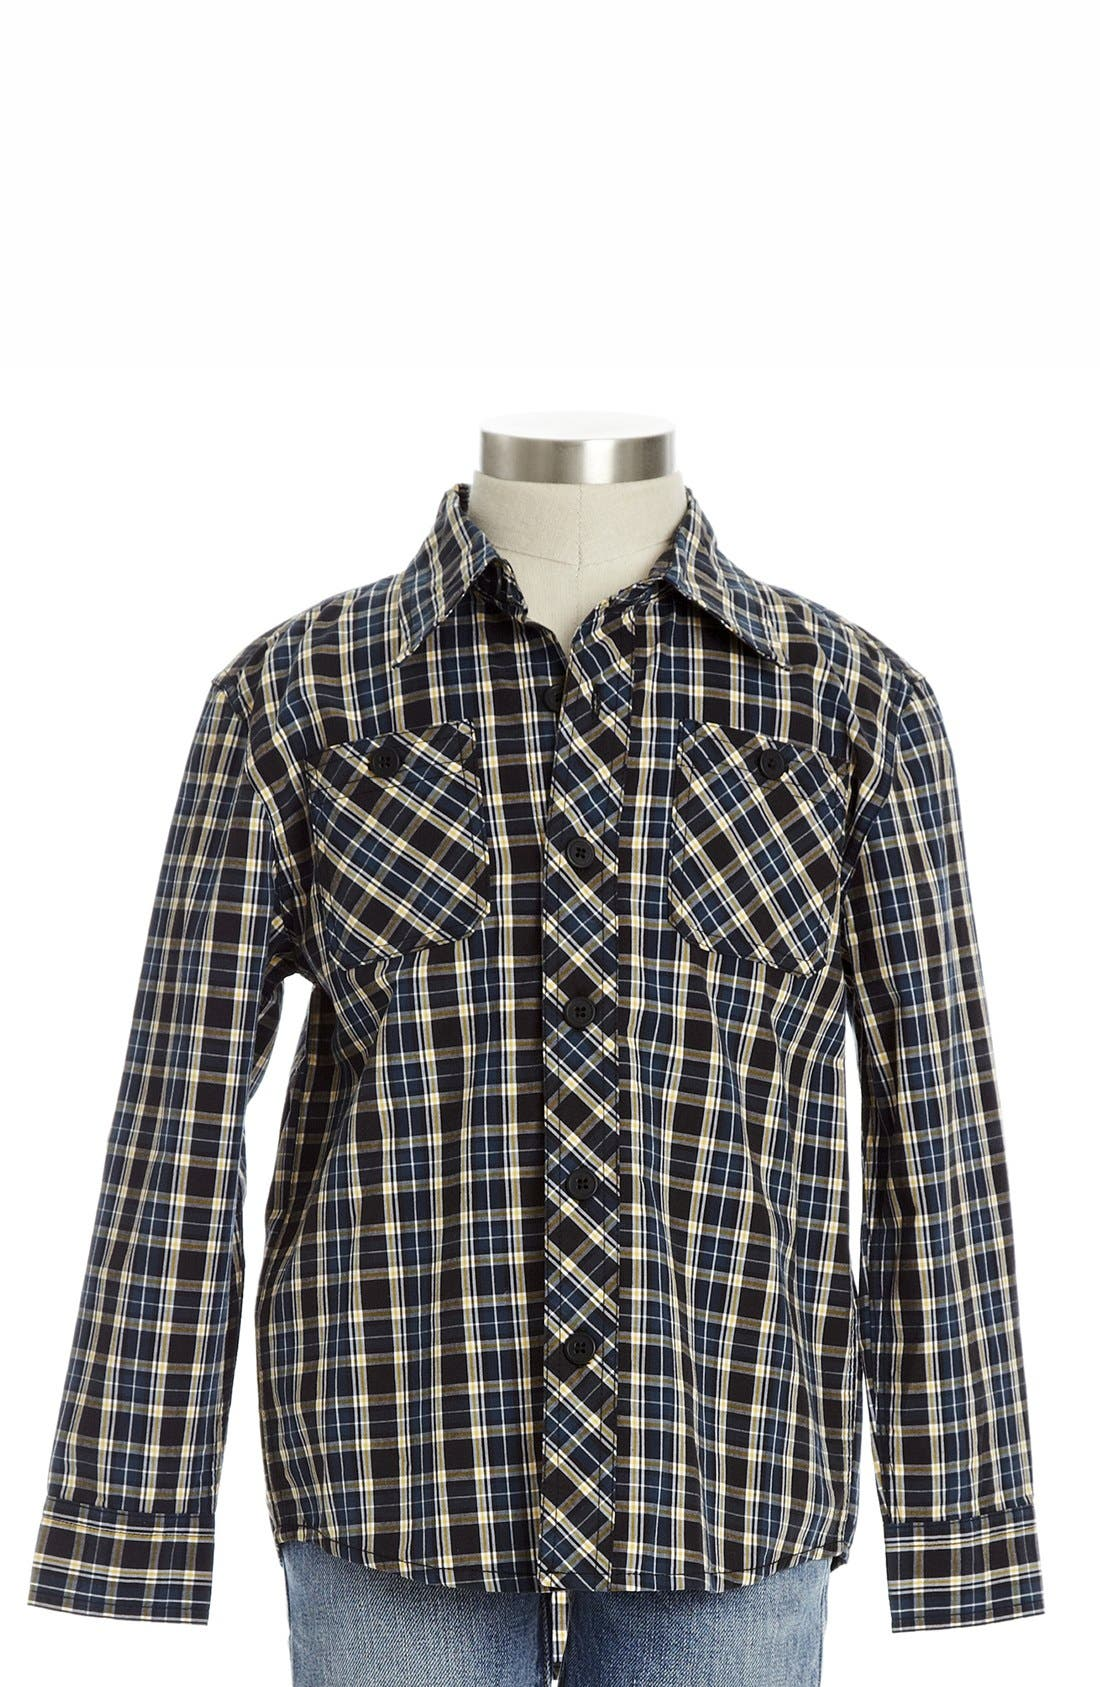 Alternate Image 1 Selected - Peek 'Costas' Utility Shirt (Toddler Boys, Little Boys & Big Boys)